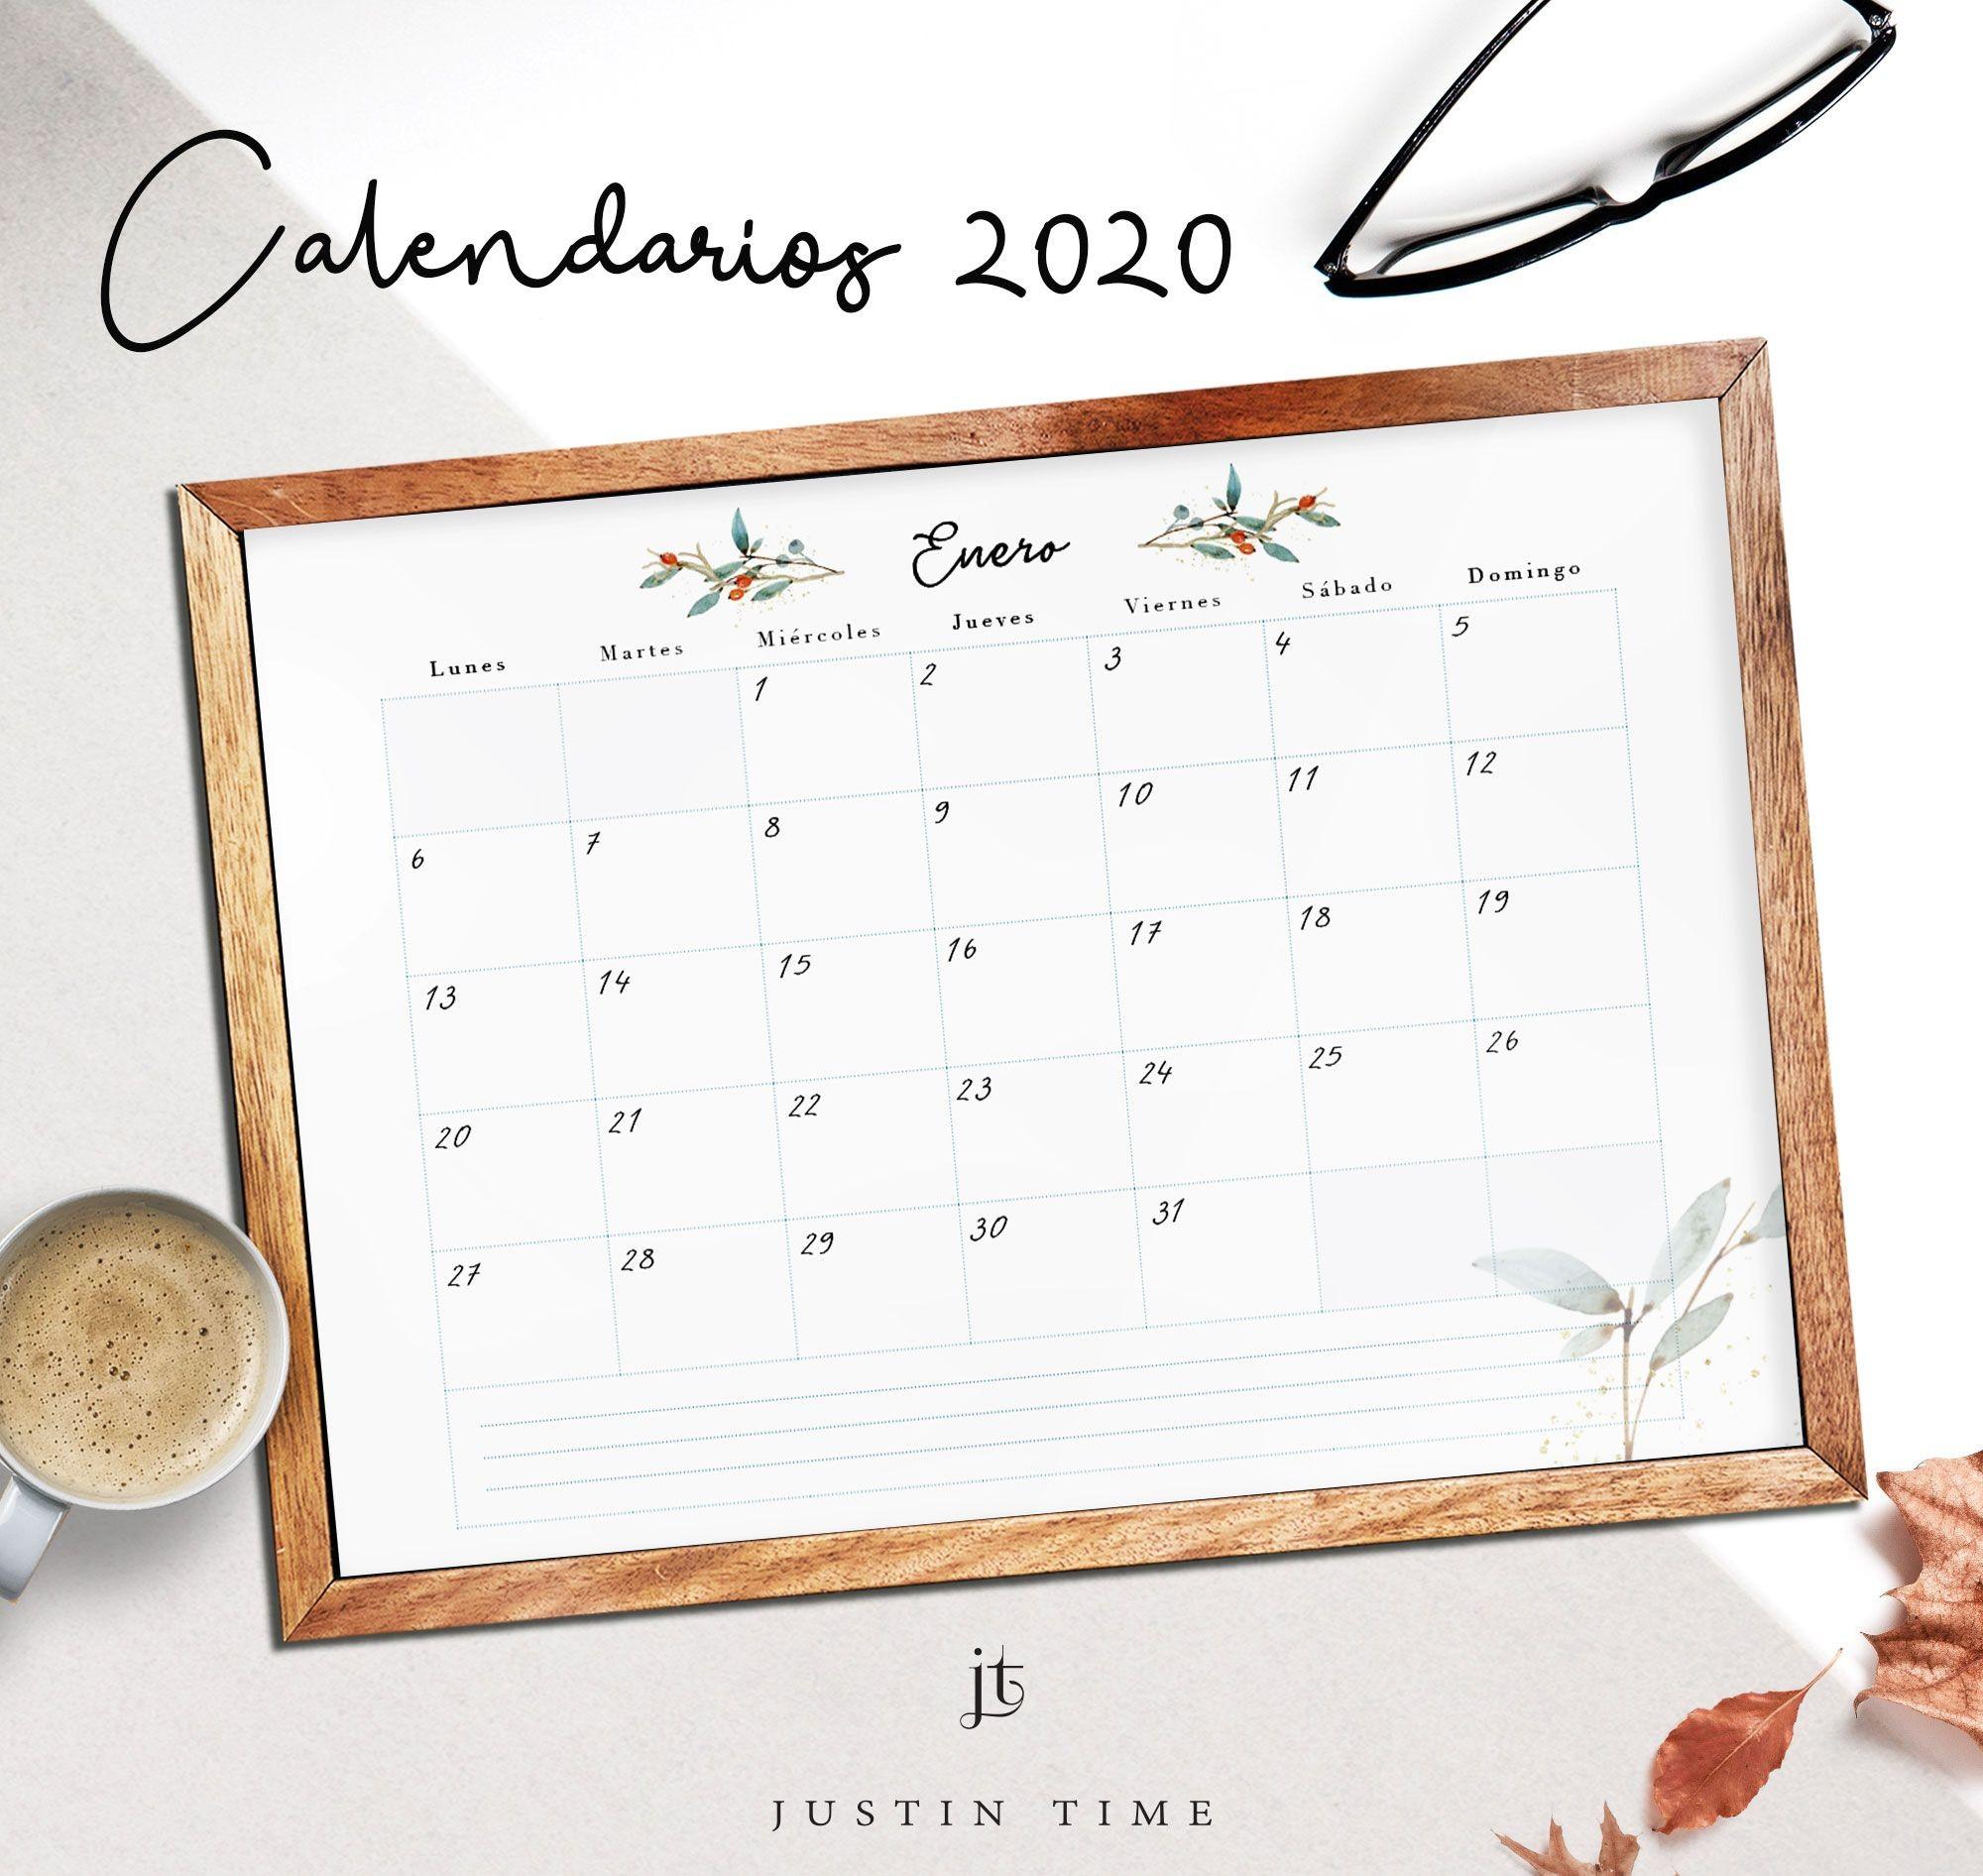 Calendario 2020 Jan Más Reciente Calendario Imprimible Para Escribir A3 A4 Y A5 Calendario Of Calendario 2020 Jan Más Populares Free Excel Calendar Templates Monthly Template Ic 2020 S